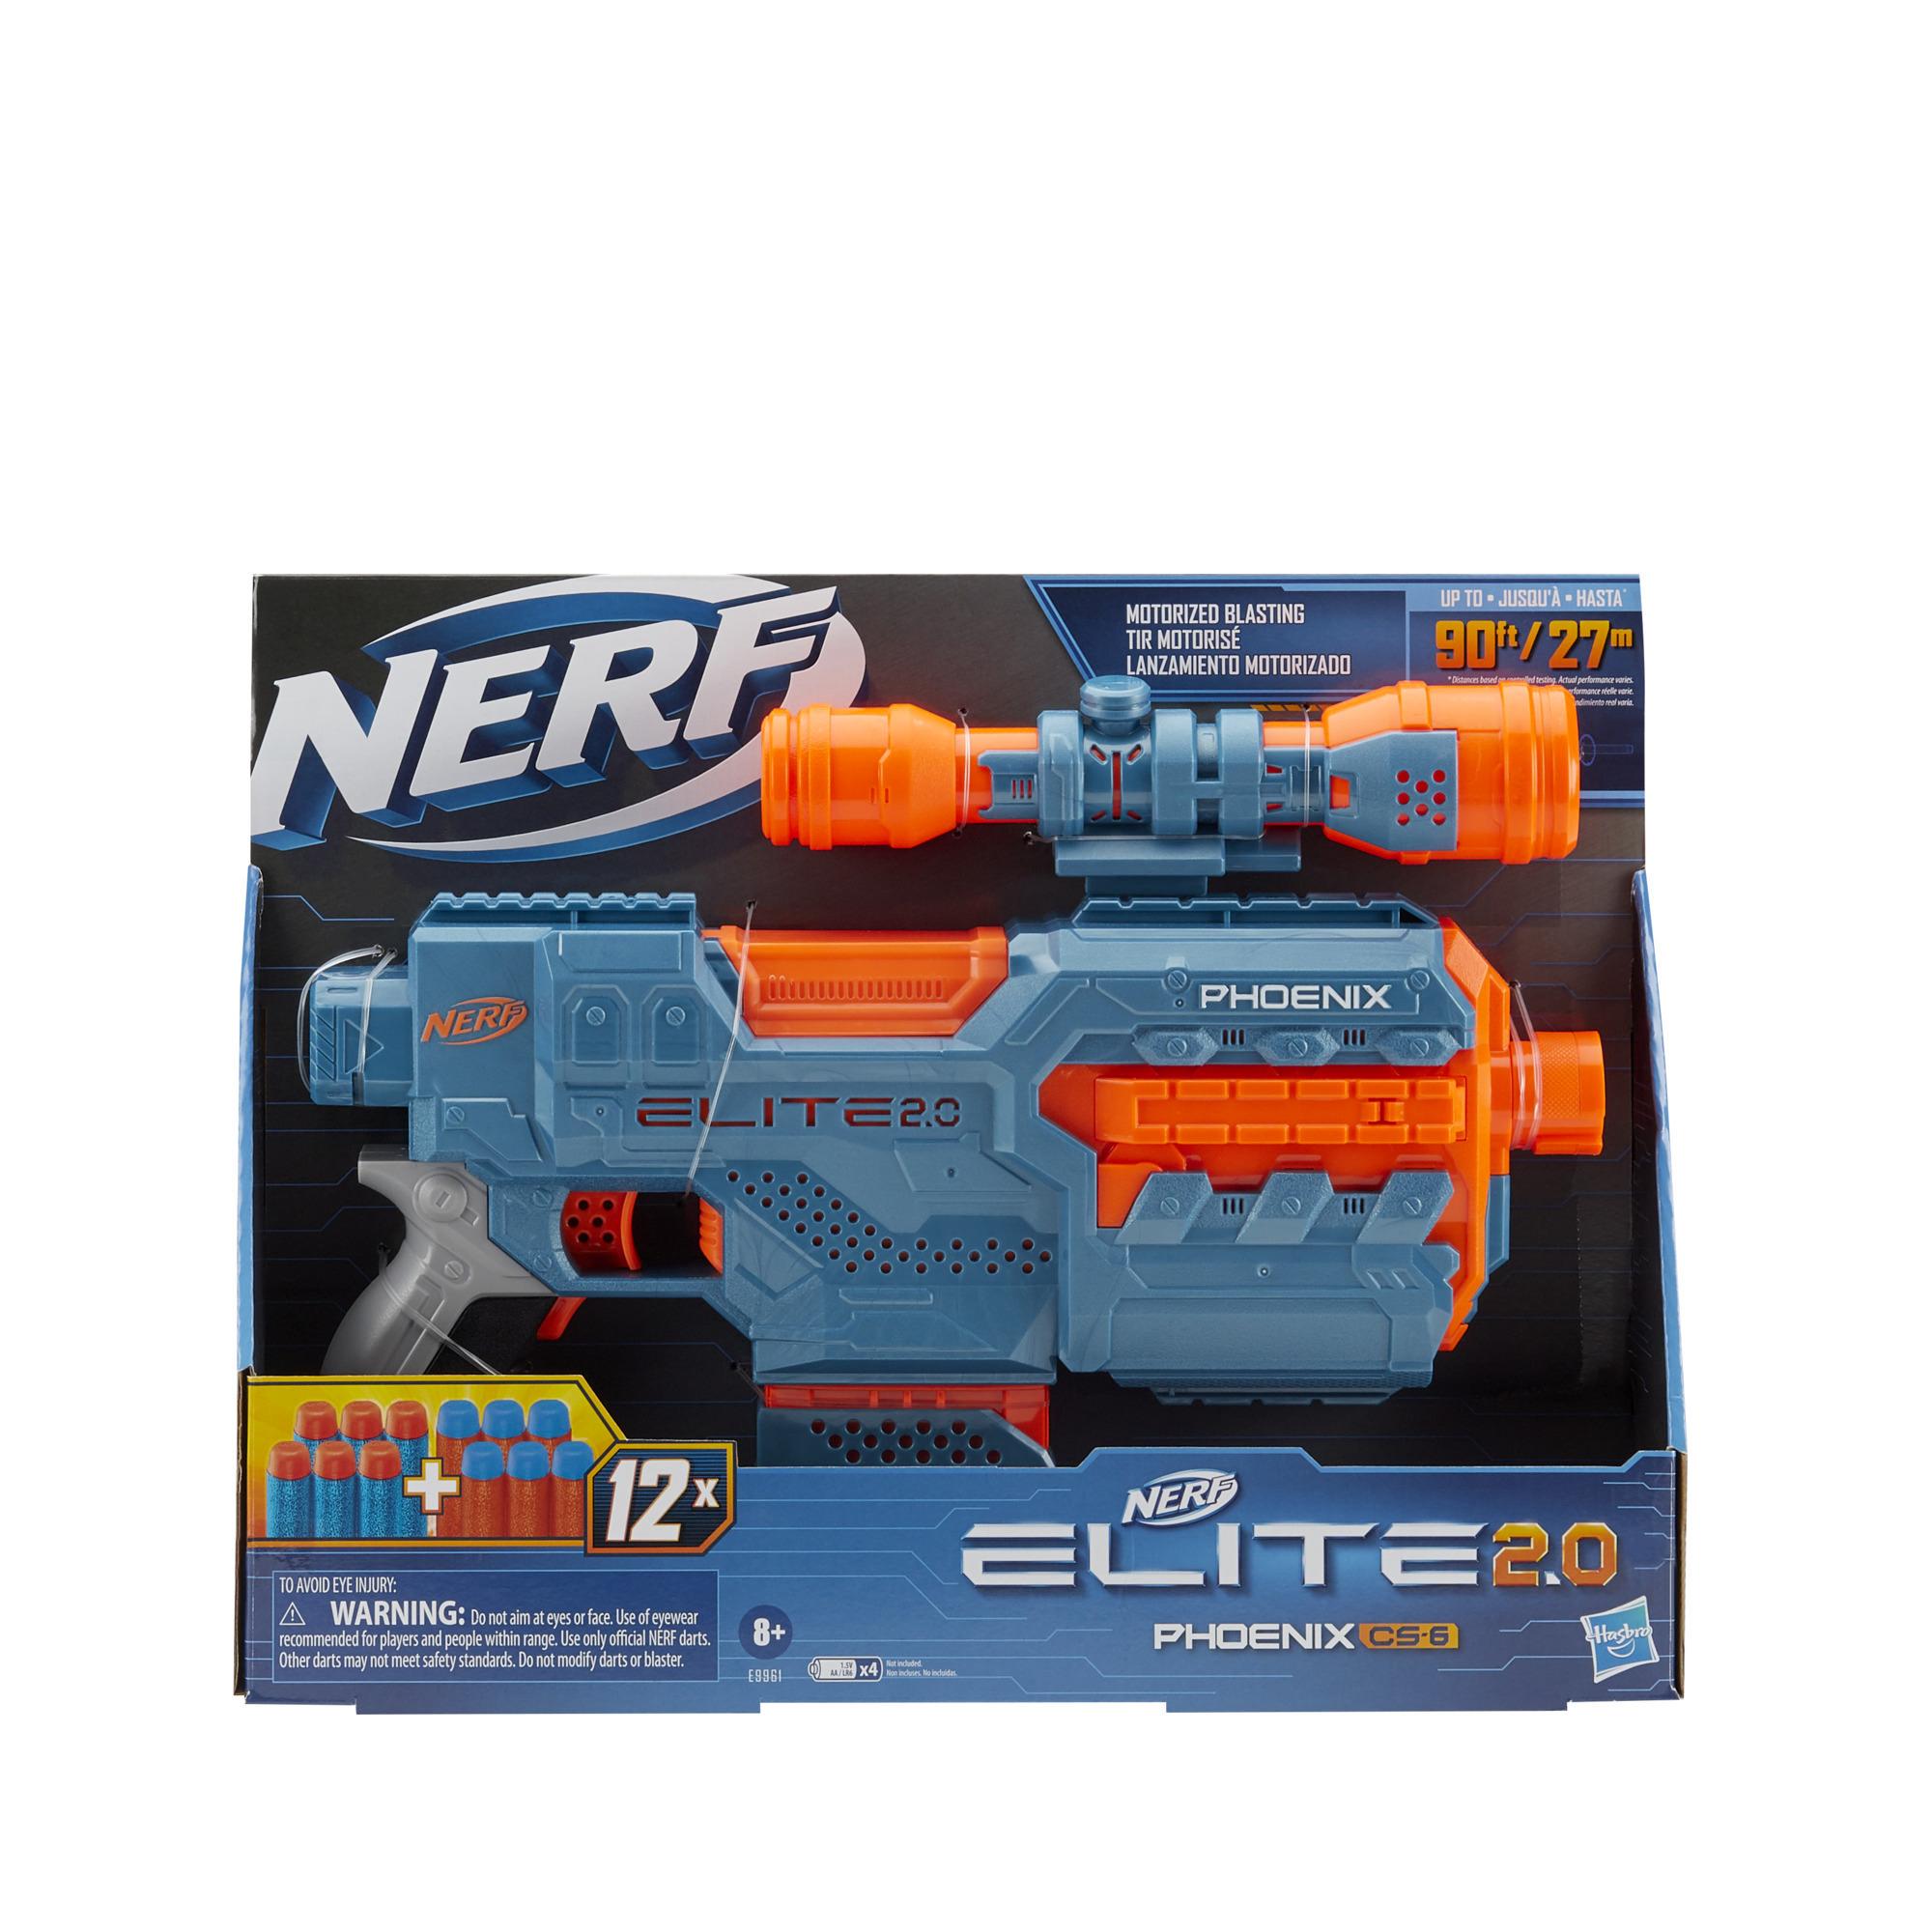 Nerf Elite 2.0 Phoenix CS-6 Μηχανοκίνητος εκτοξευτής, 12 επίσημα βελάκια Nerf, Στόχαστρο, Γεμιστήρας, Ενσωματωμένες δυνατότητες εξατομίκευσης